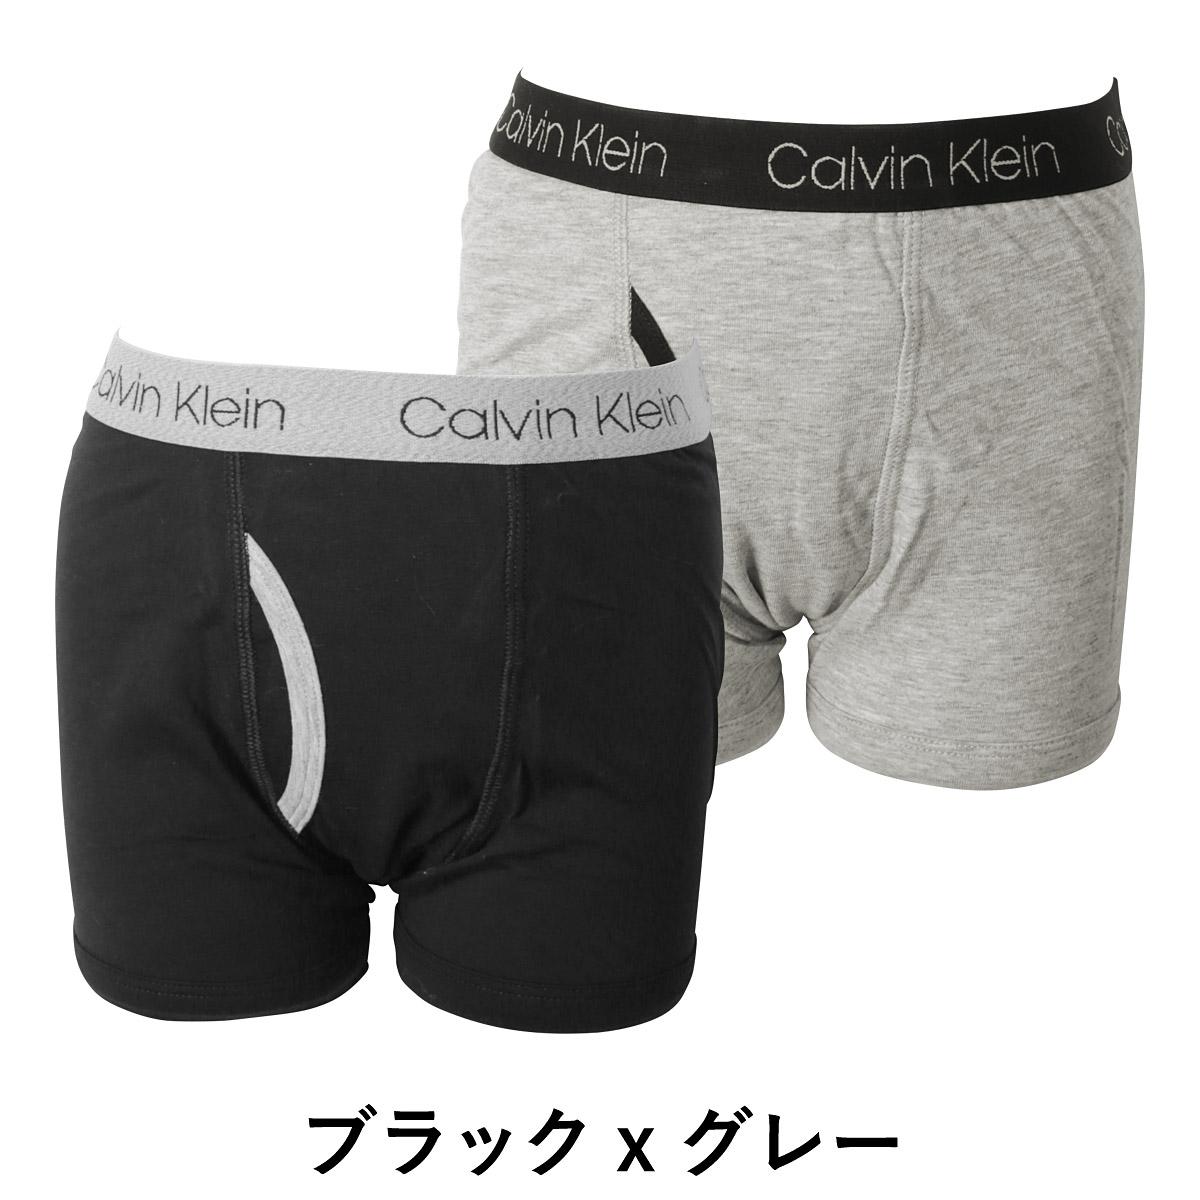 716ac5afe5427e Group of two pieces of Calvin Klein boxer underwear kids underwear BOYS  CORE CLASSIC Boys Jr. child toddler kids underwear article fashion set Calvin  Klein ...